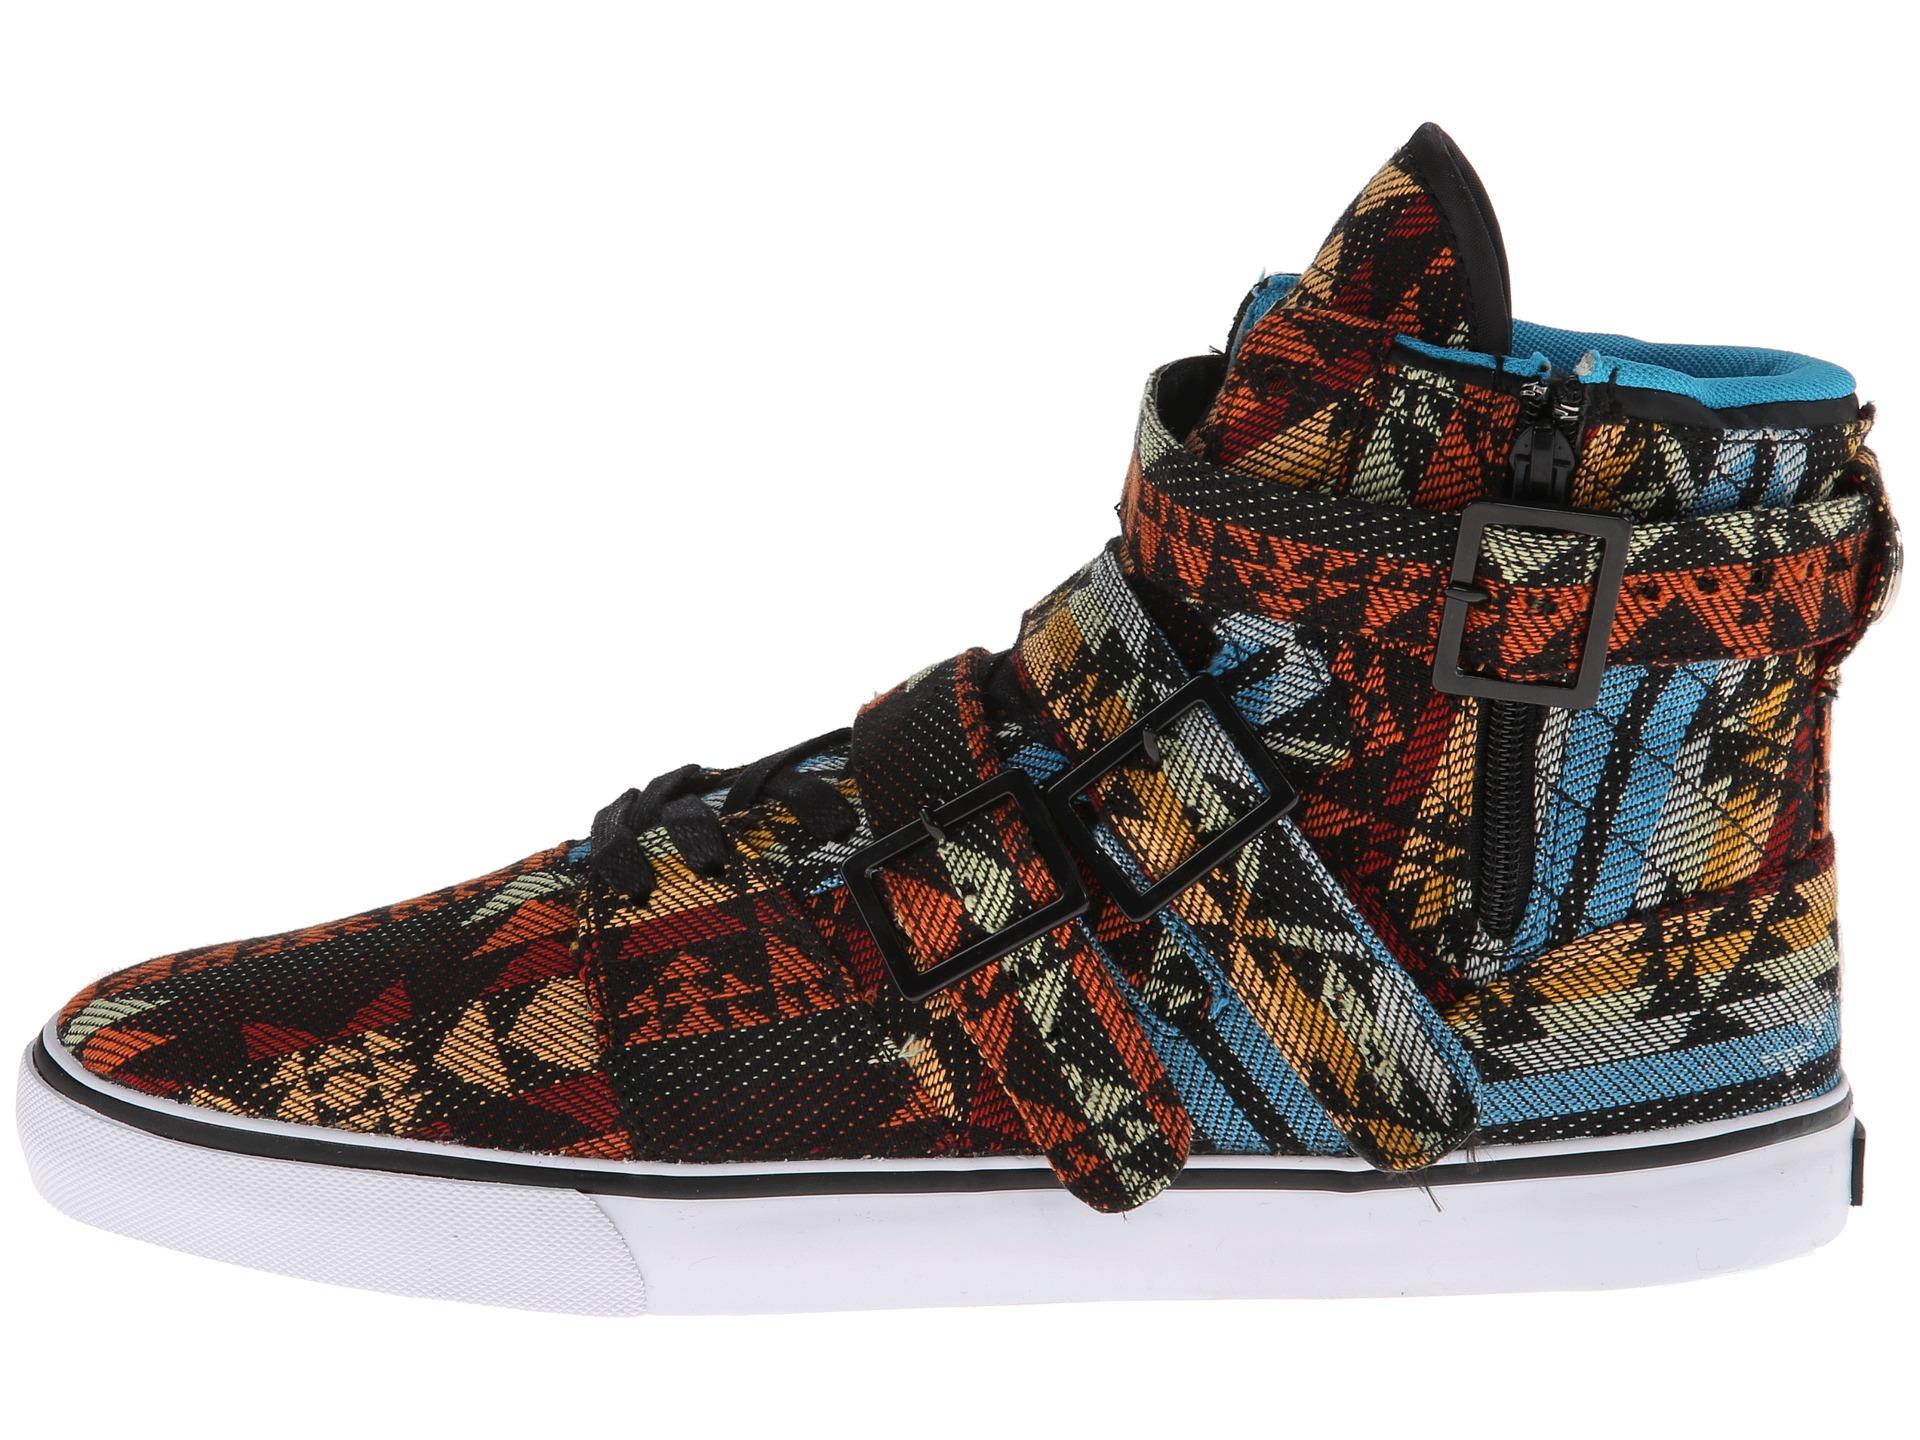 radii footwear jacket vlc zappos free